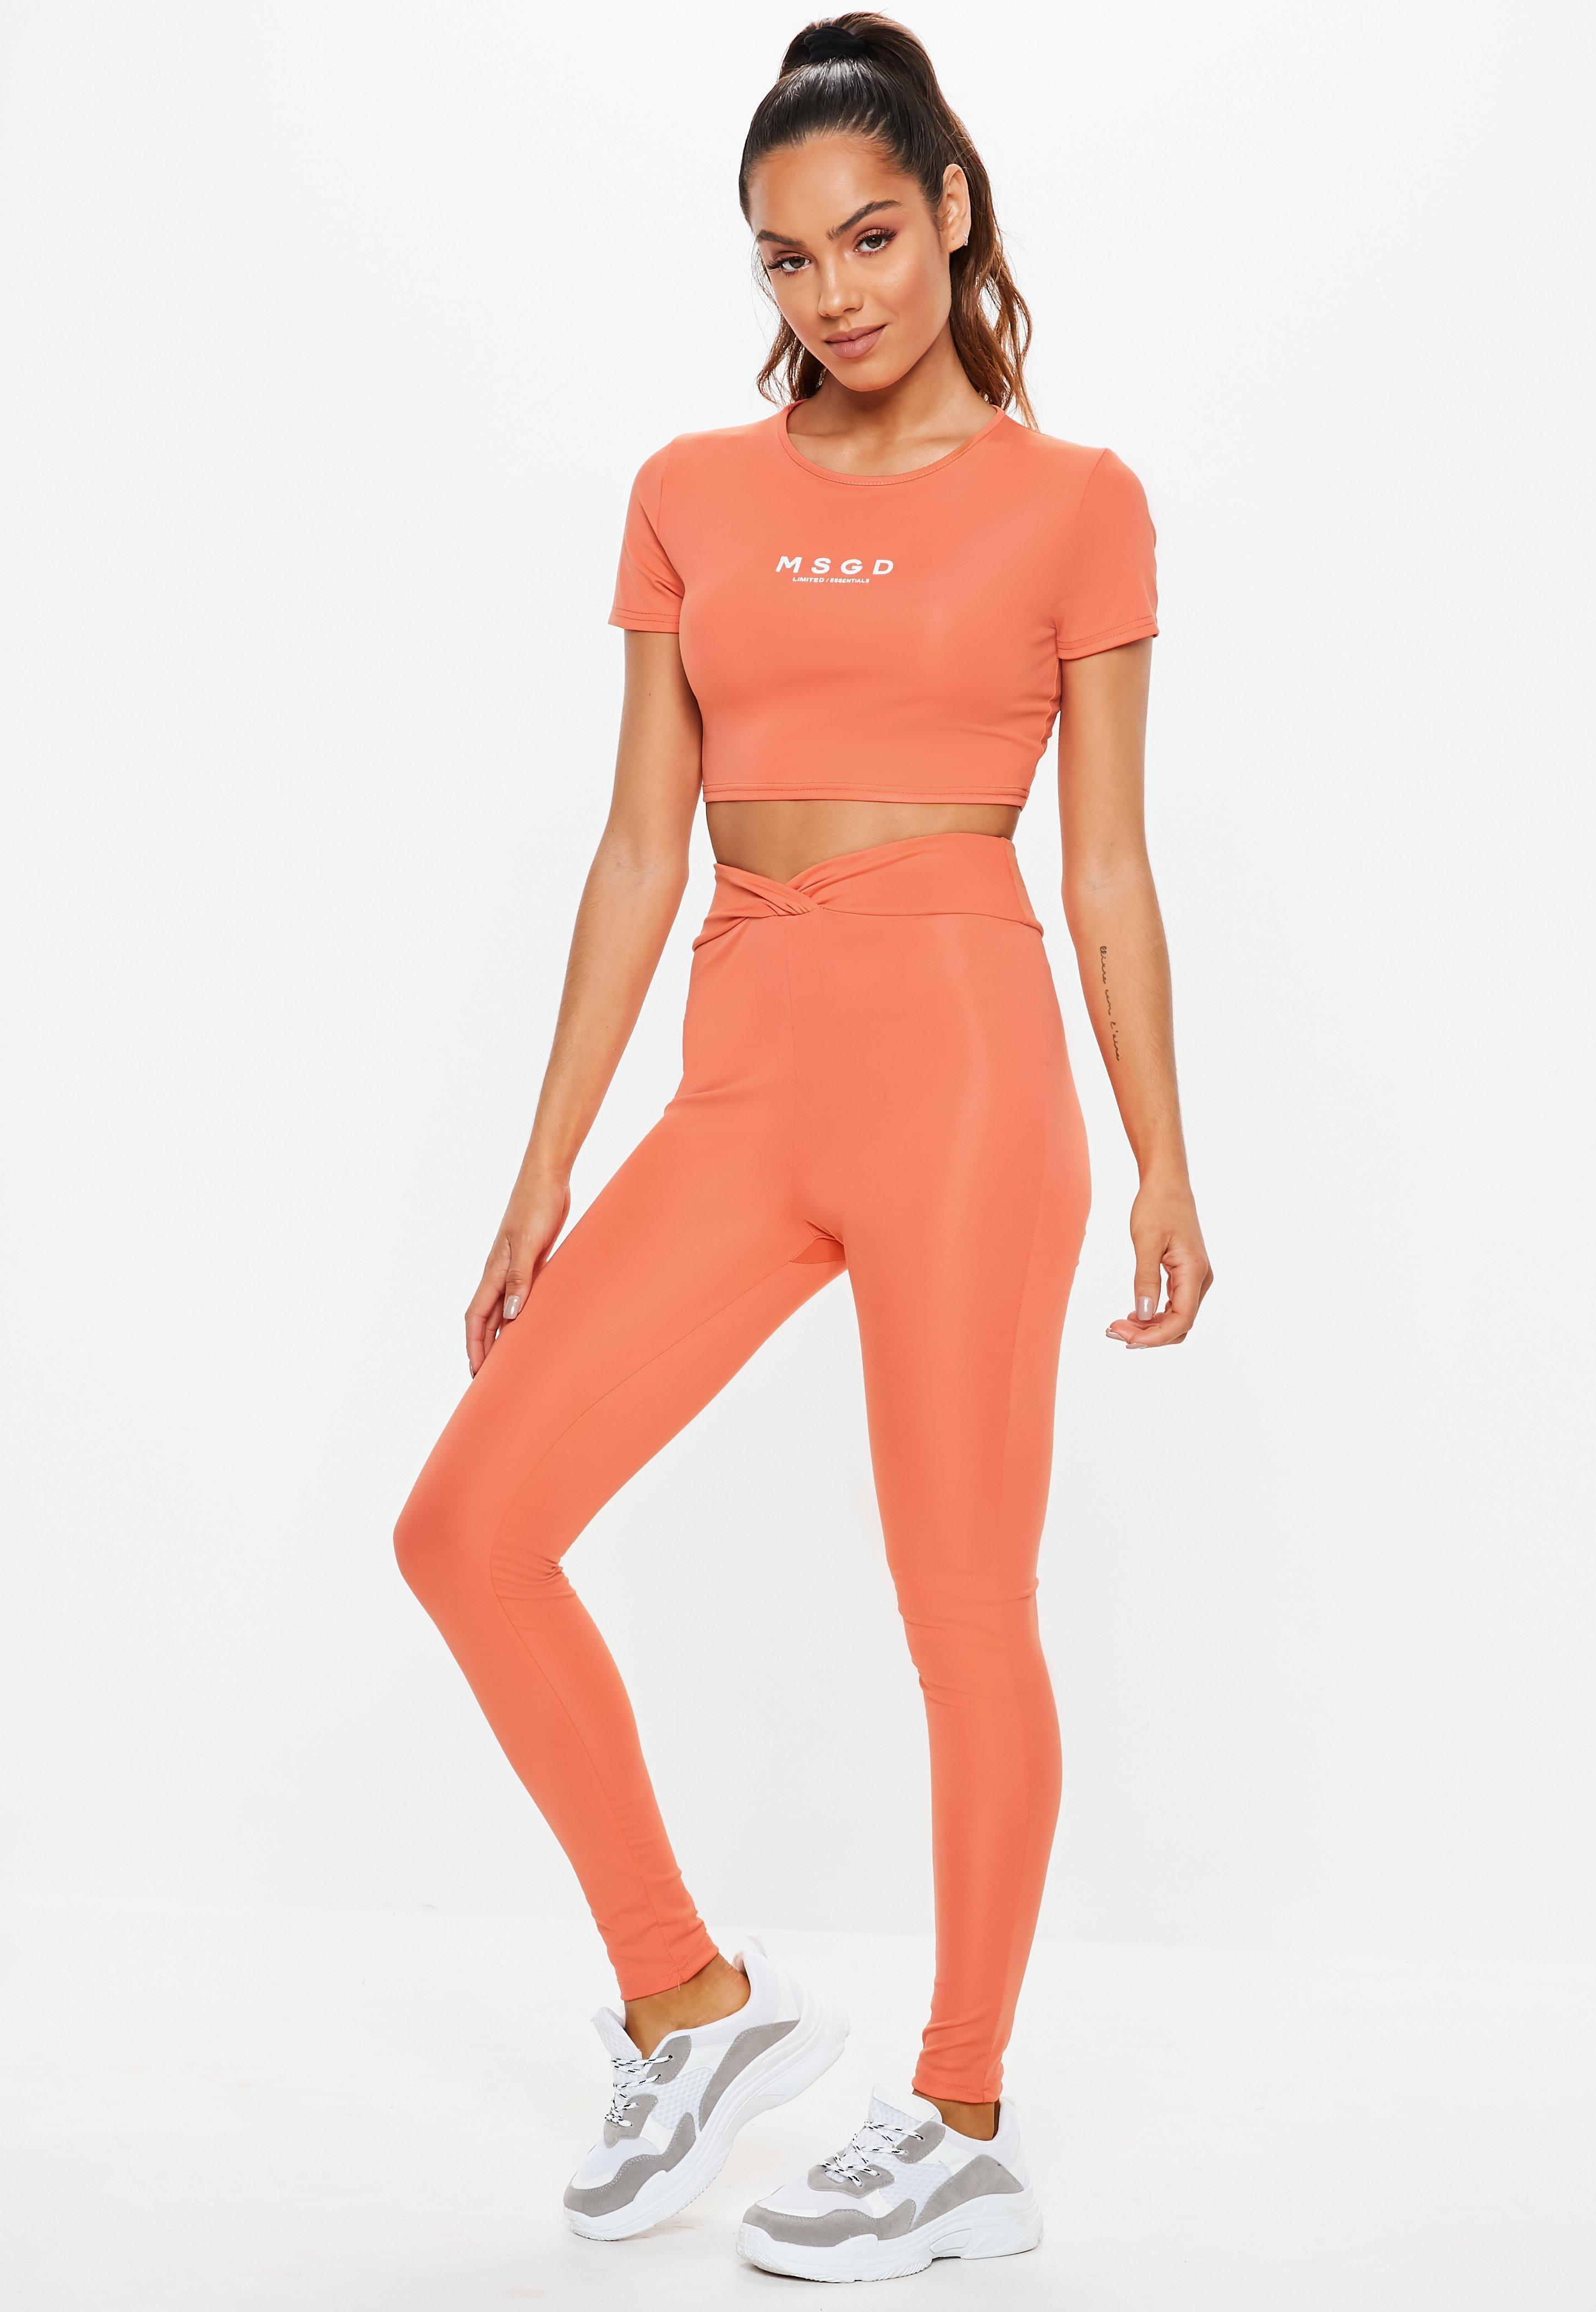 b3e5c95998339d Missguided - Active Orange Short Sleeve Crop Top - Lyst. View fullscreen